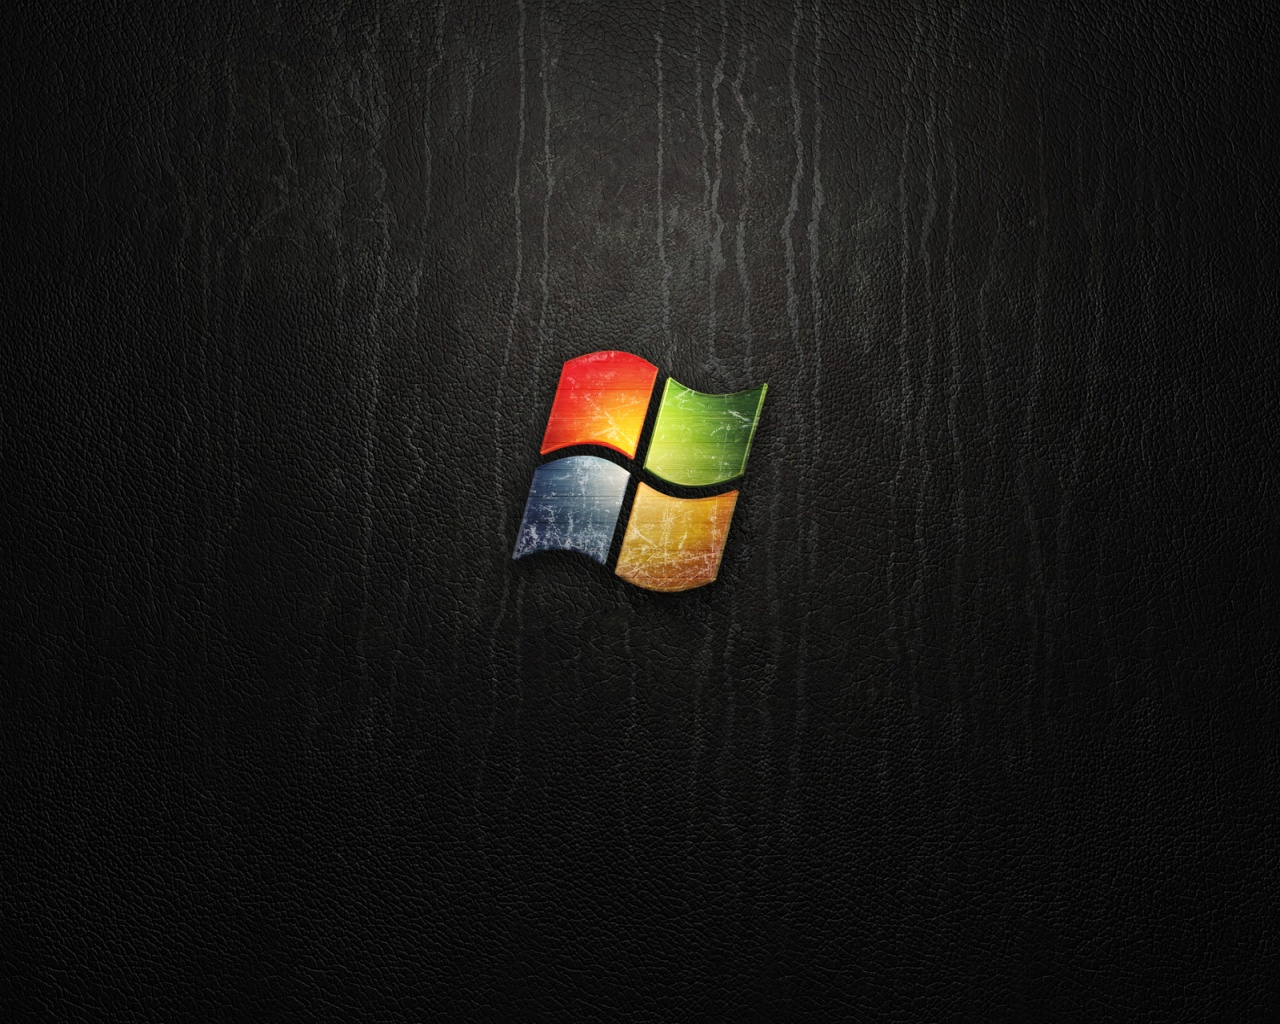 Windows 10 Wallpaper 1280x1024 - WallpaperSafari